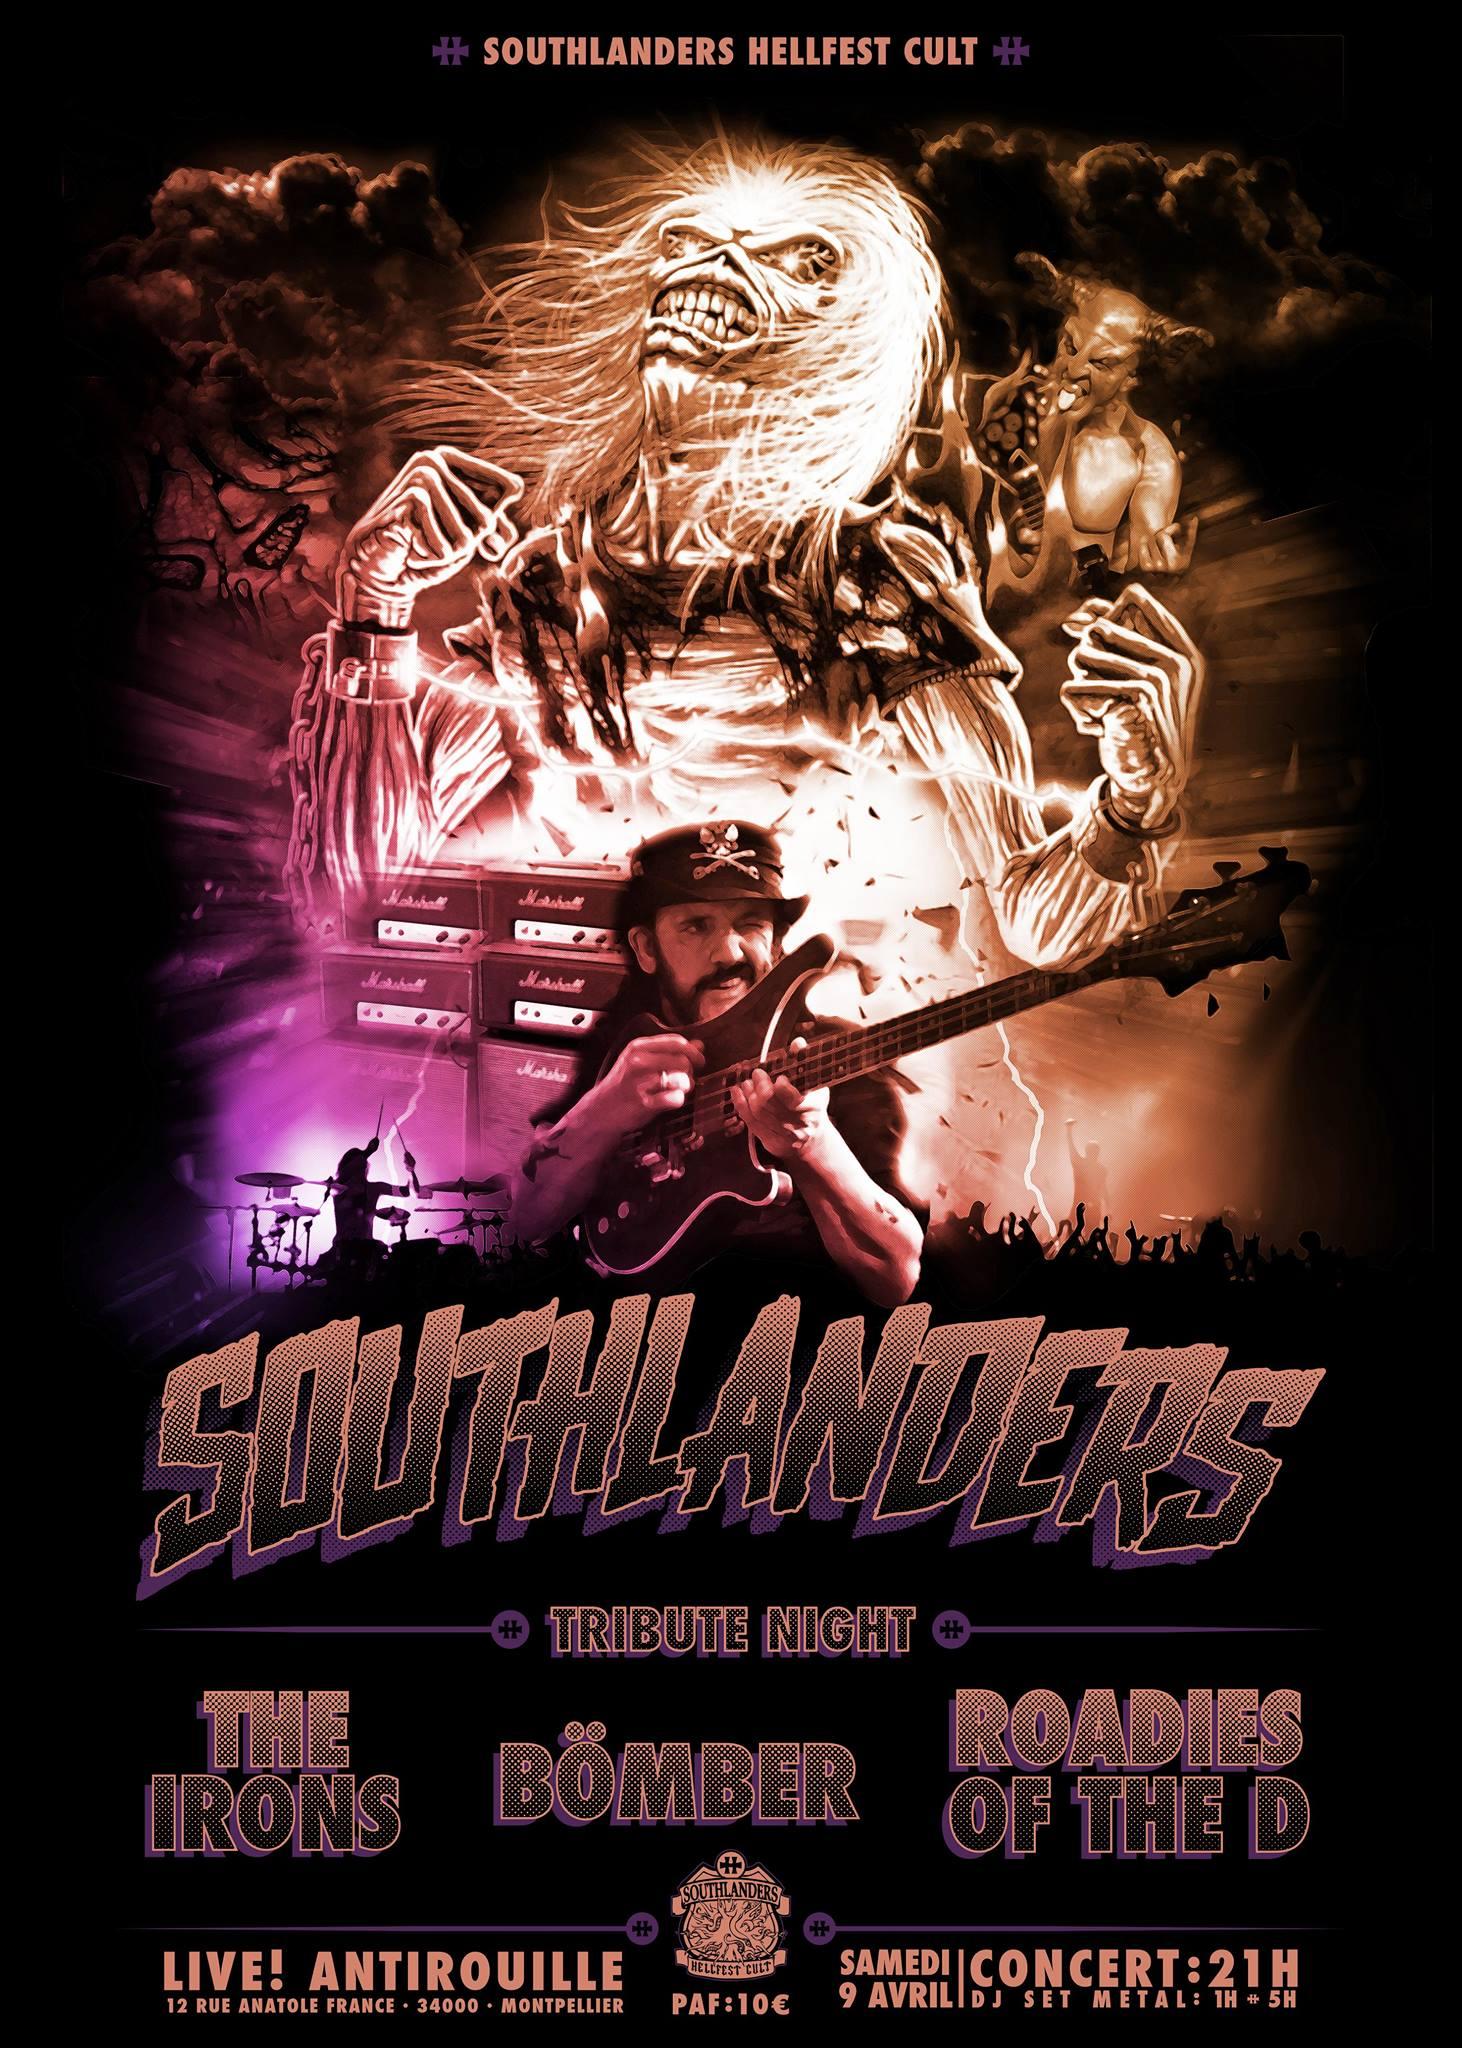 Southlanders